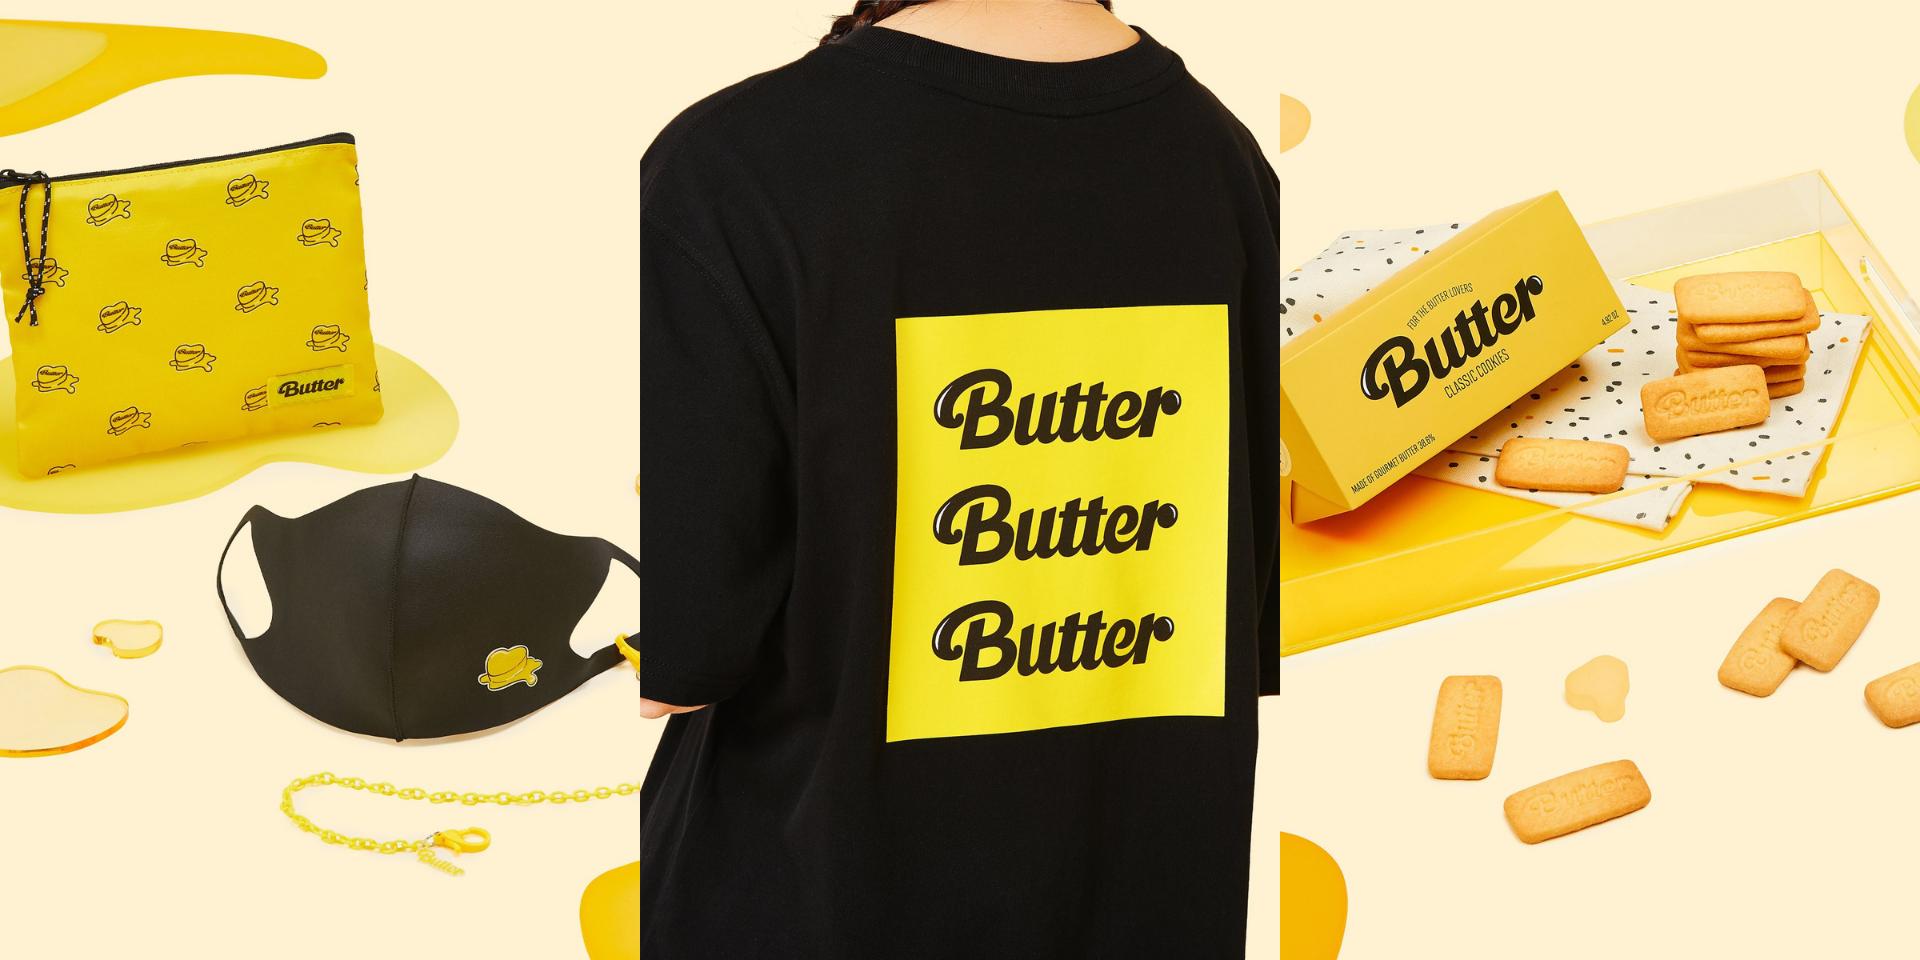 BTS unveil 'Butter' merch – butter cookies, shirts, face masks, and more